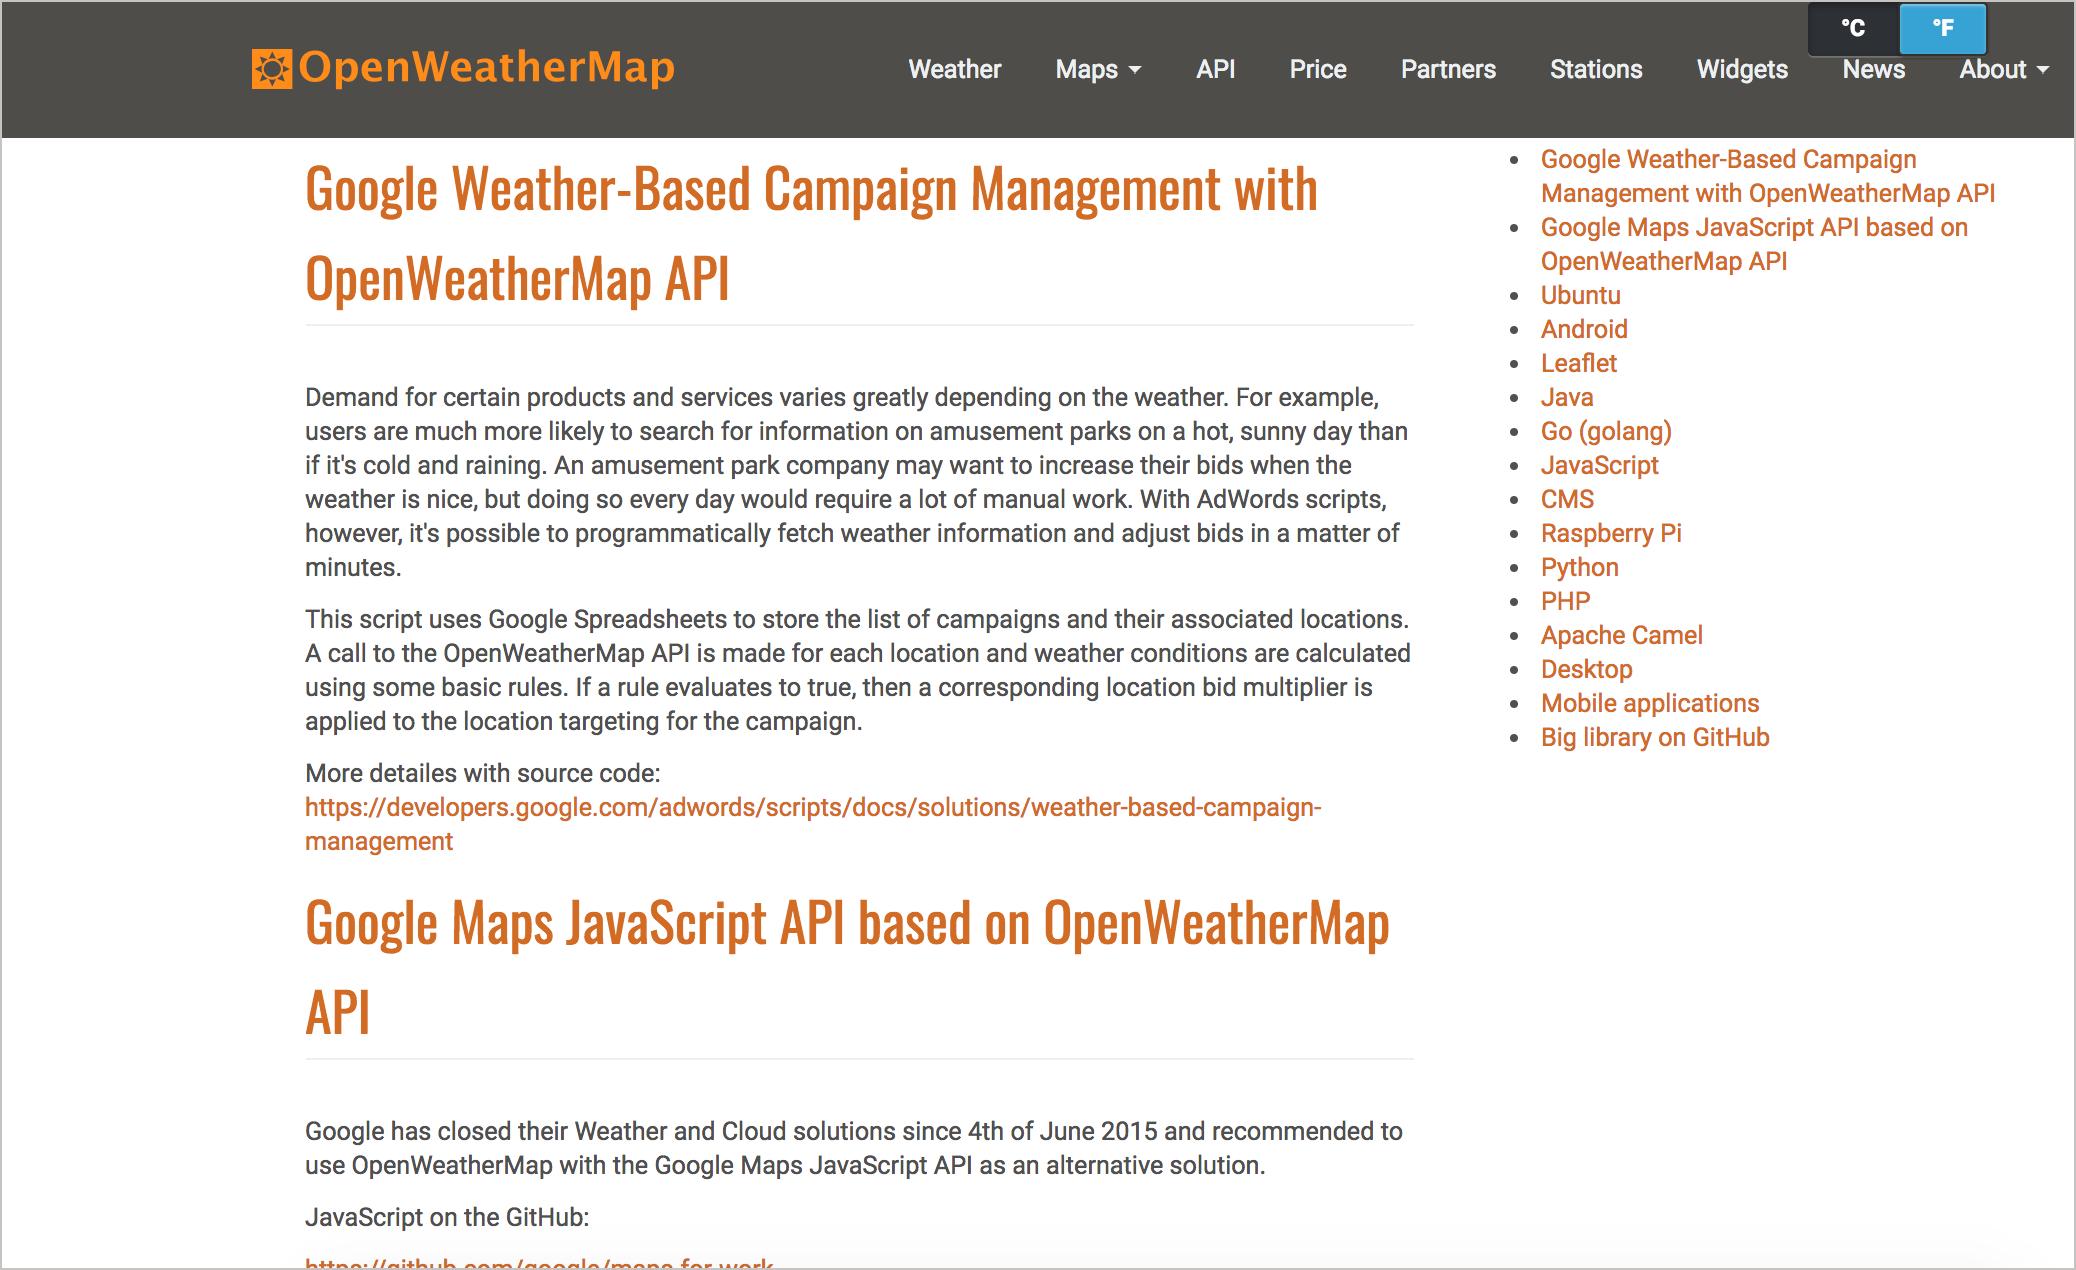 Code samples for OpenWeatherMap API